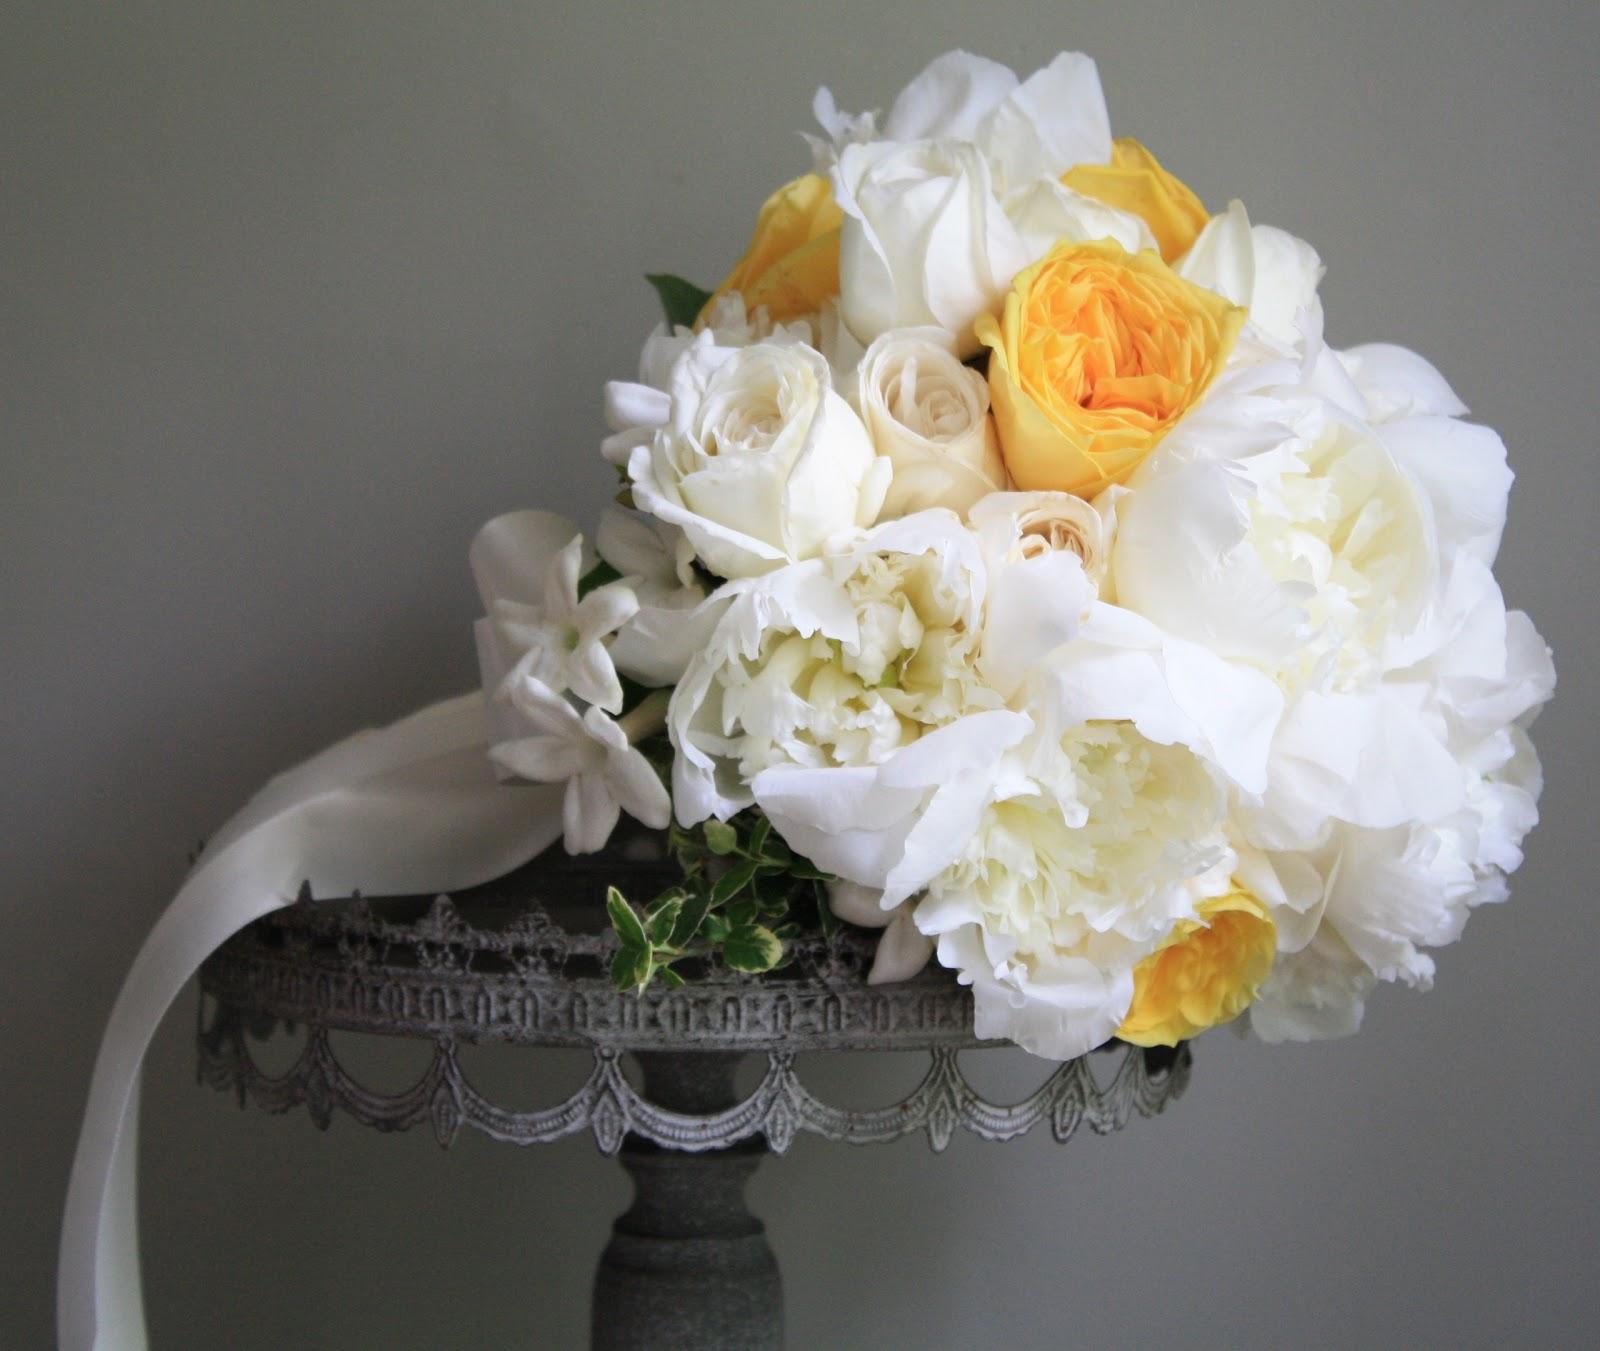 Splendid stems floral designs wedding flowers wedding florist white and yellow rose brides bouquet troy ny izmirmasajfo